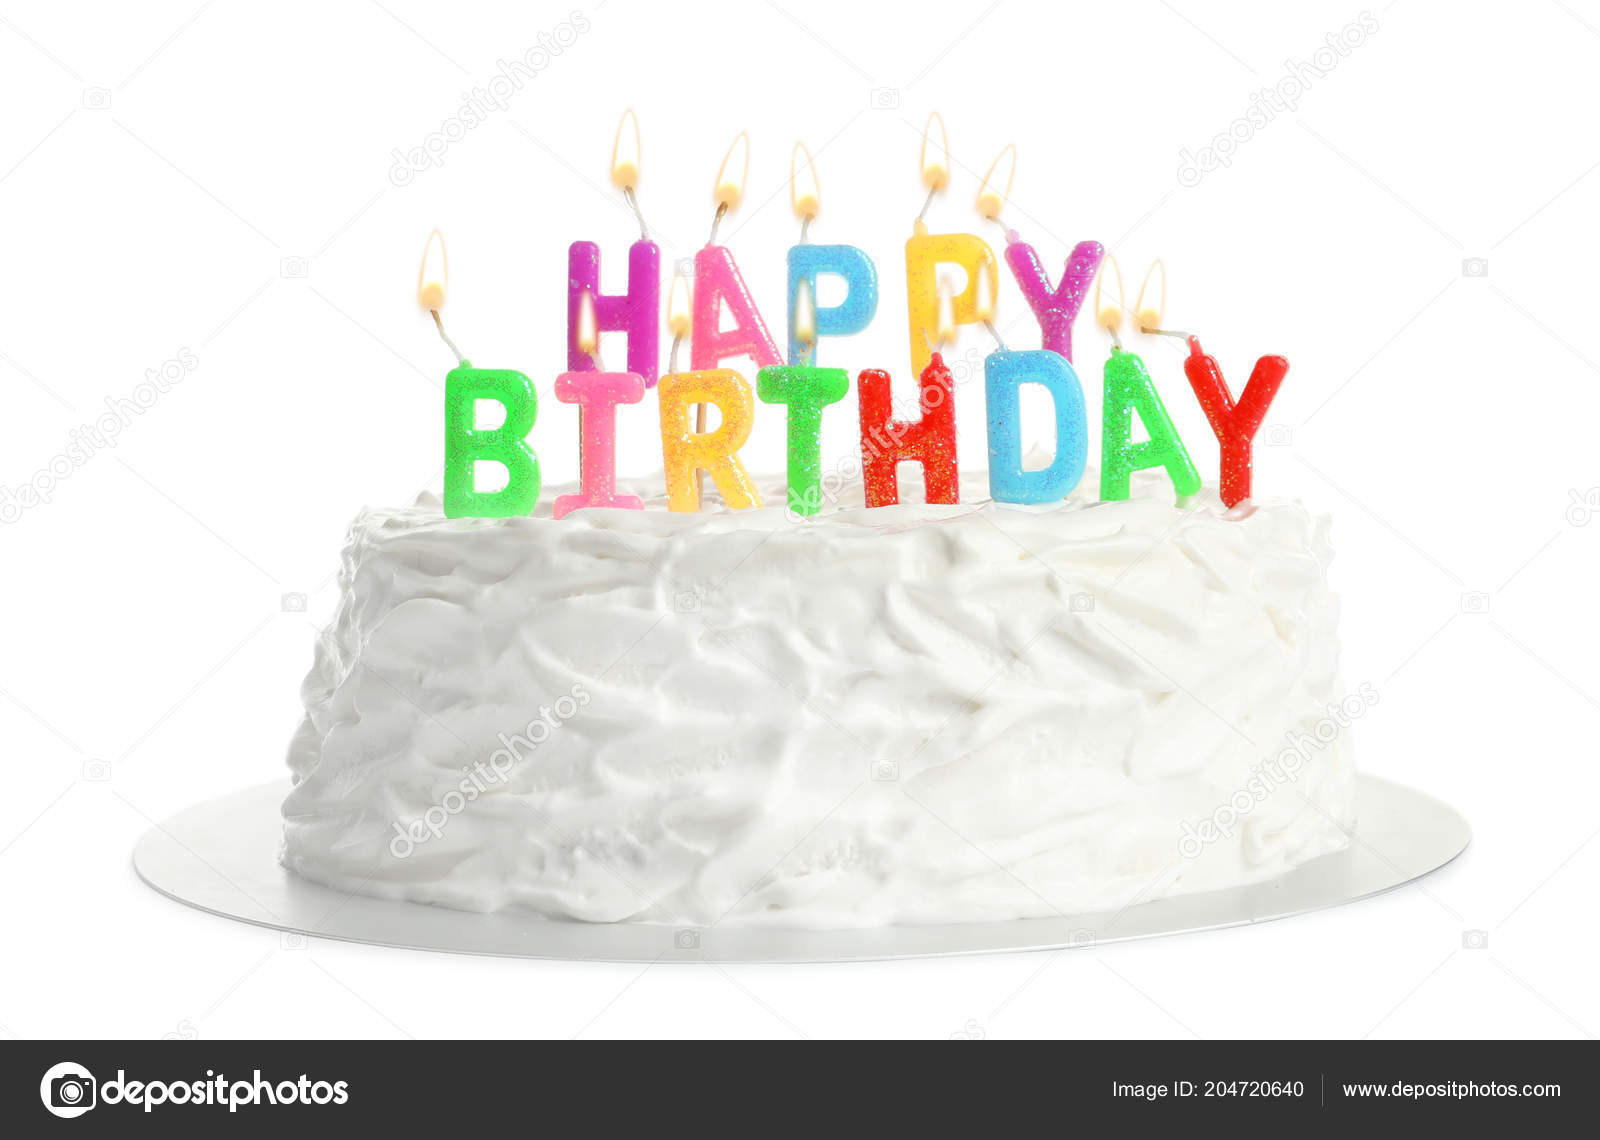 Phenomenal Birthday Cake Candles White Background Stock Photo Funny Birthday Cards Online Elaedamsfinfo